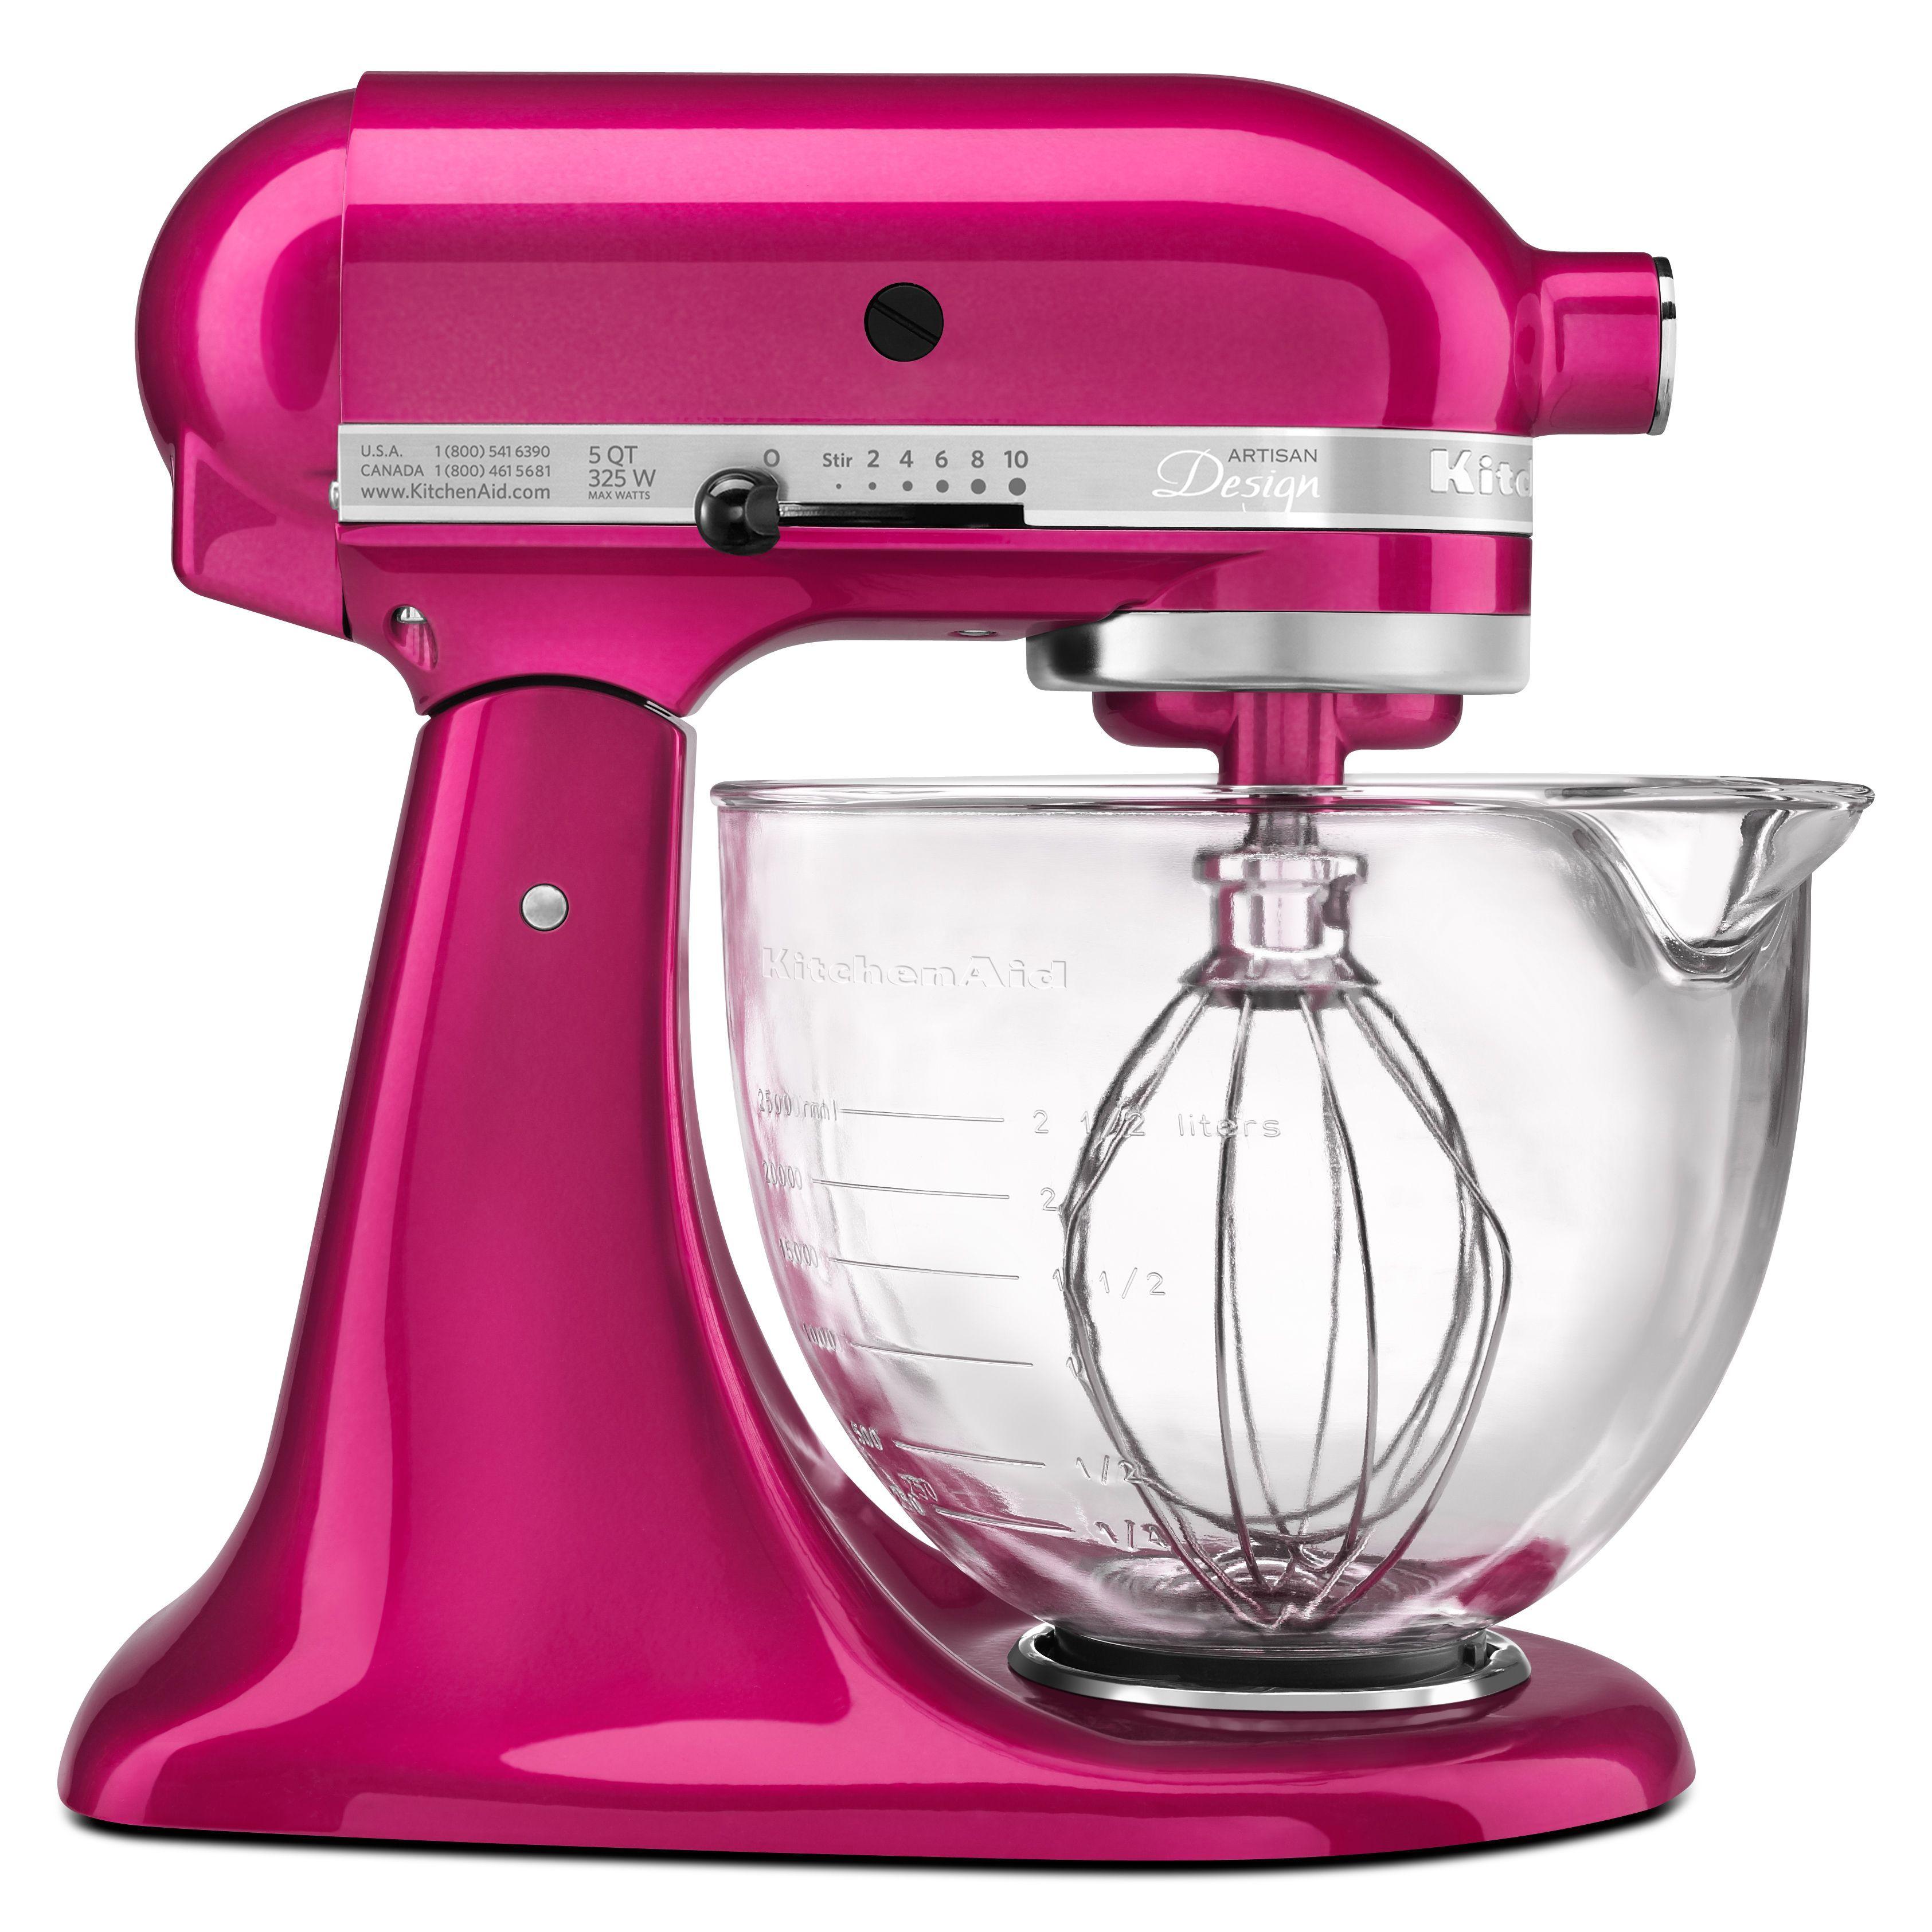 Kitchenaid Ksm155gbri Raspberry Ice 5 Quart Tilt Head Stand Mixer